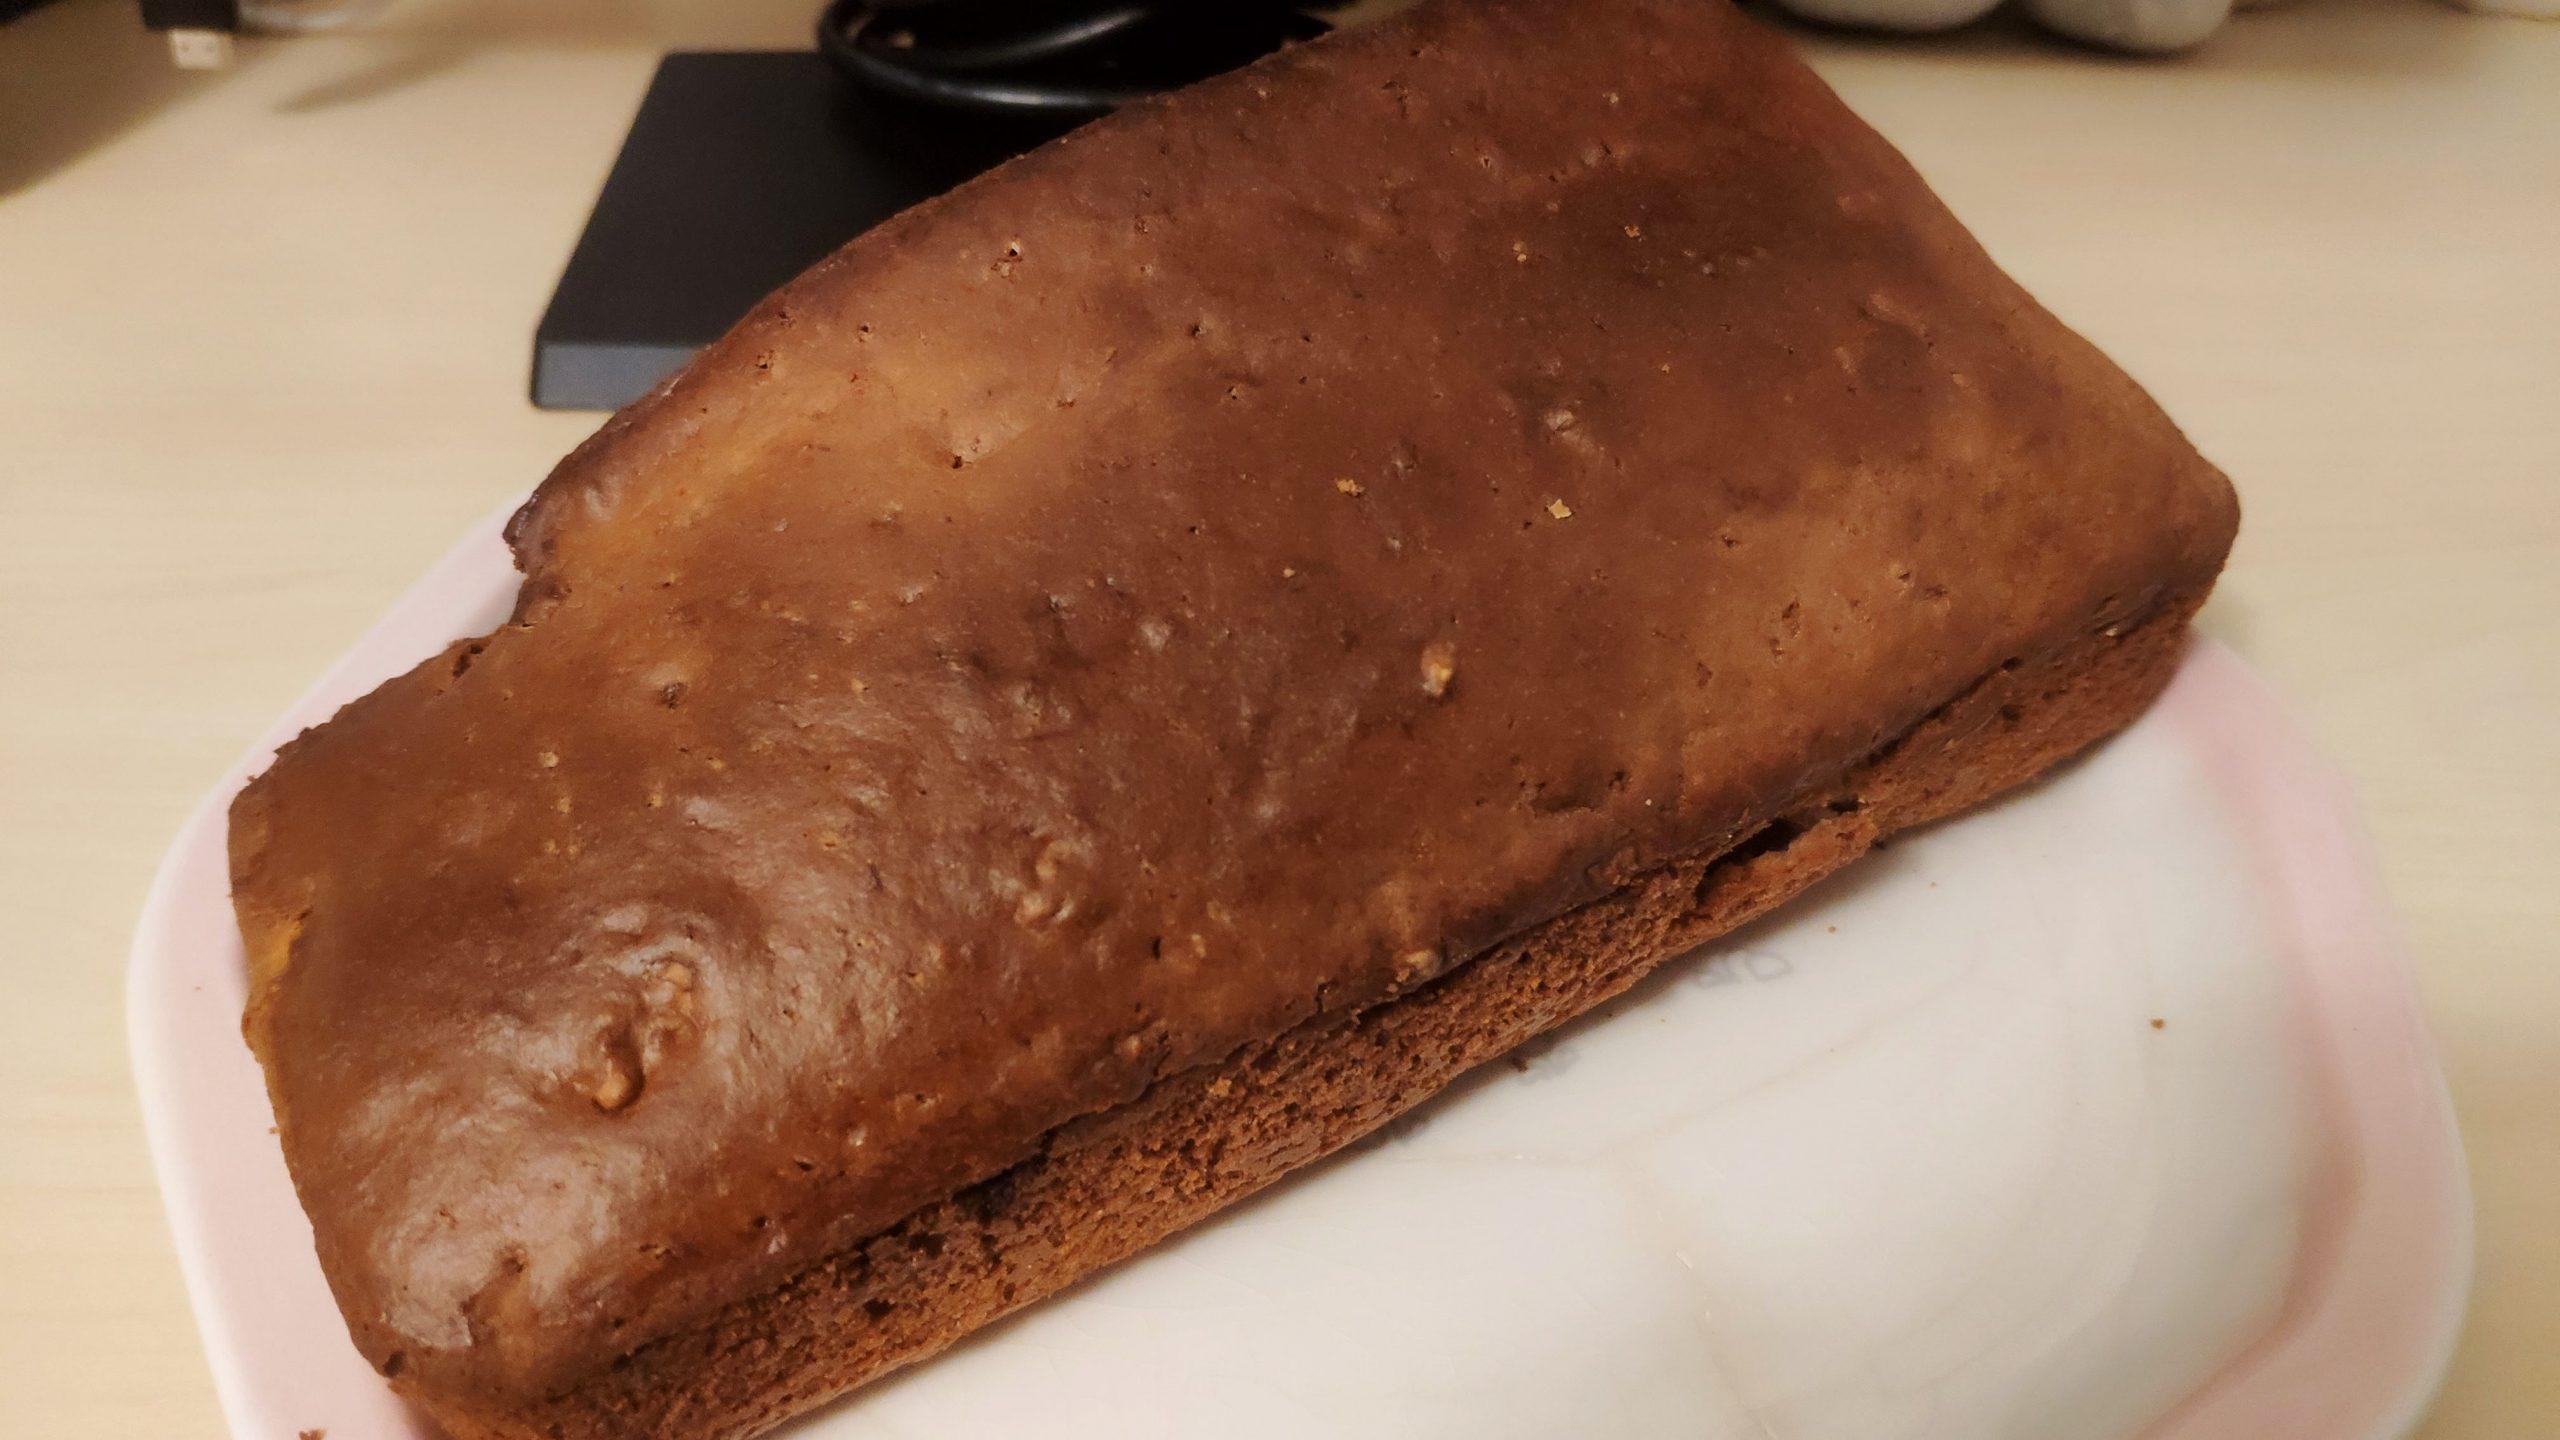 Recette de banana bread léger